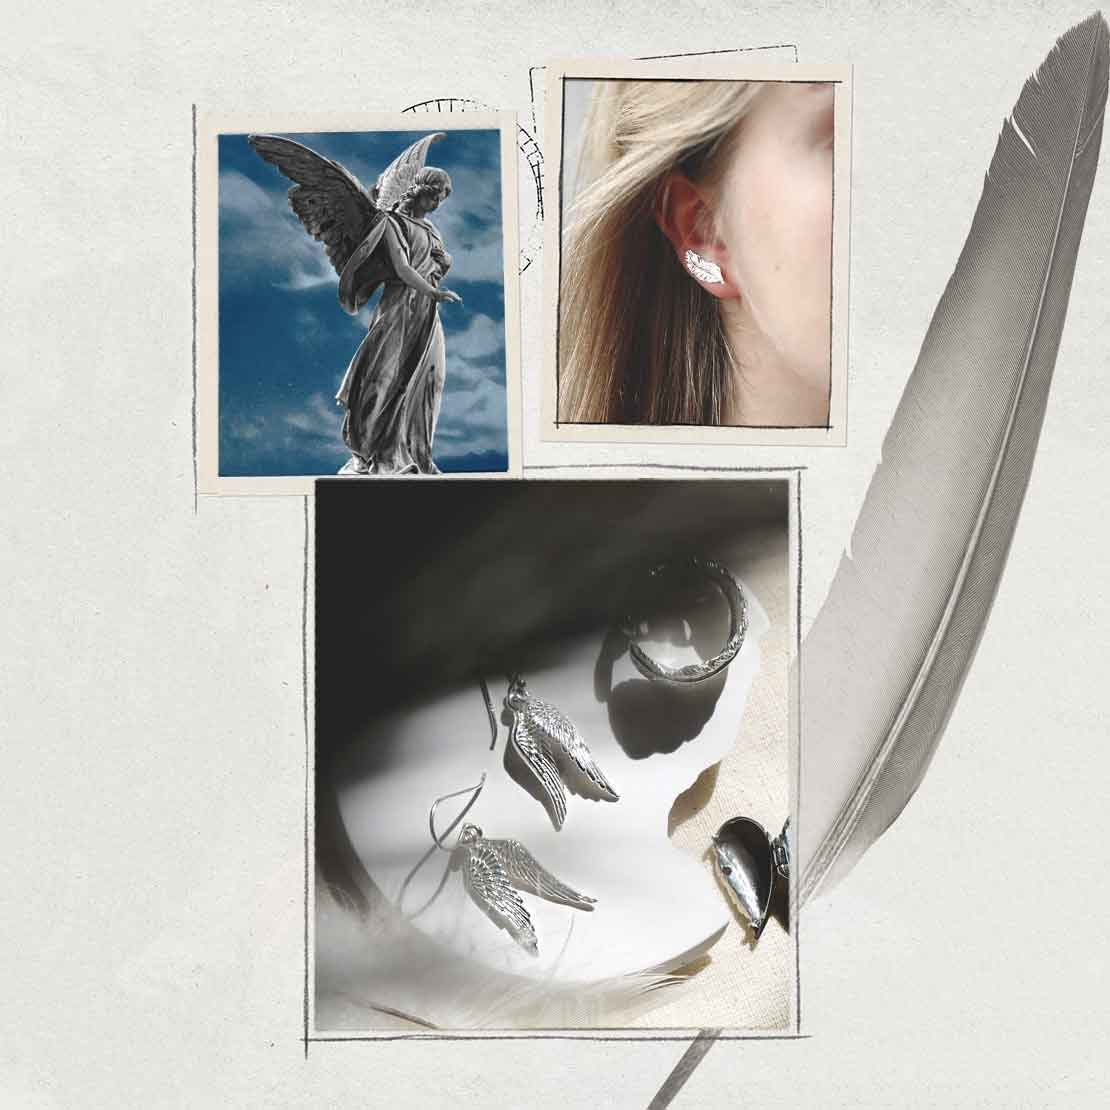 angelic-feather-body-image-1110x1110